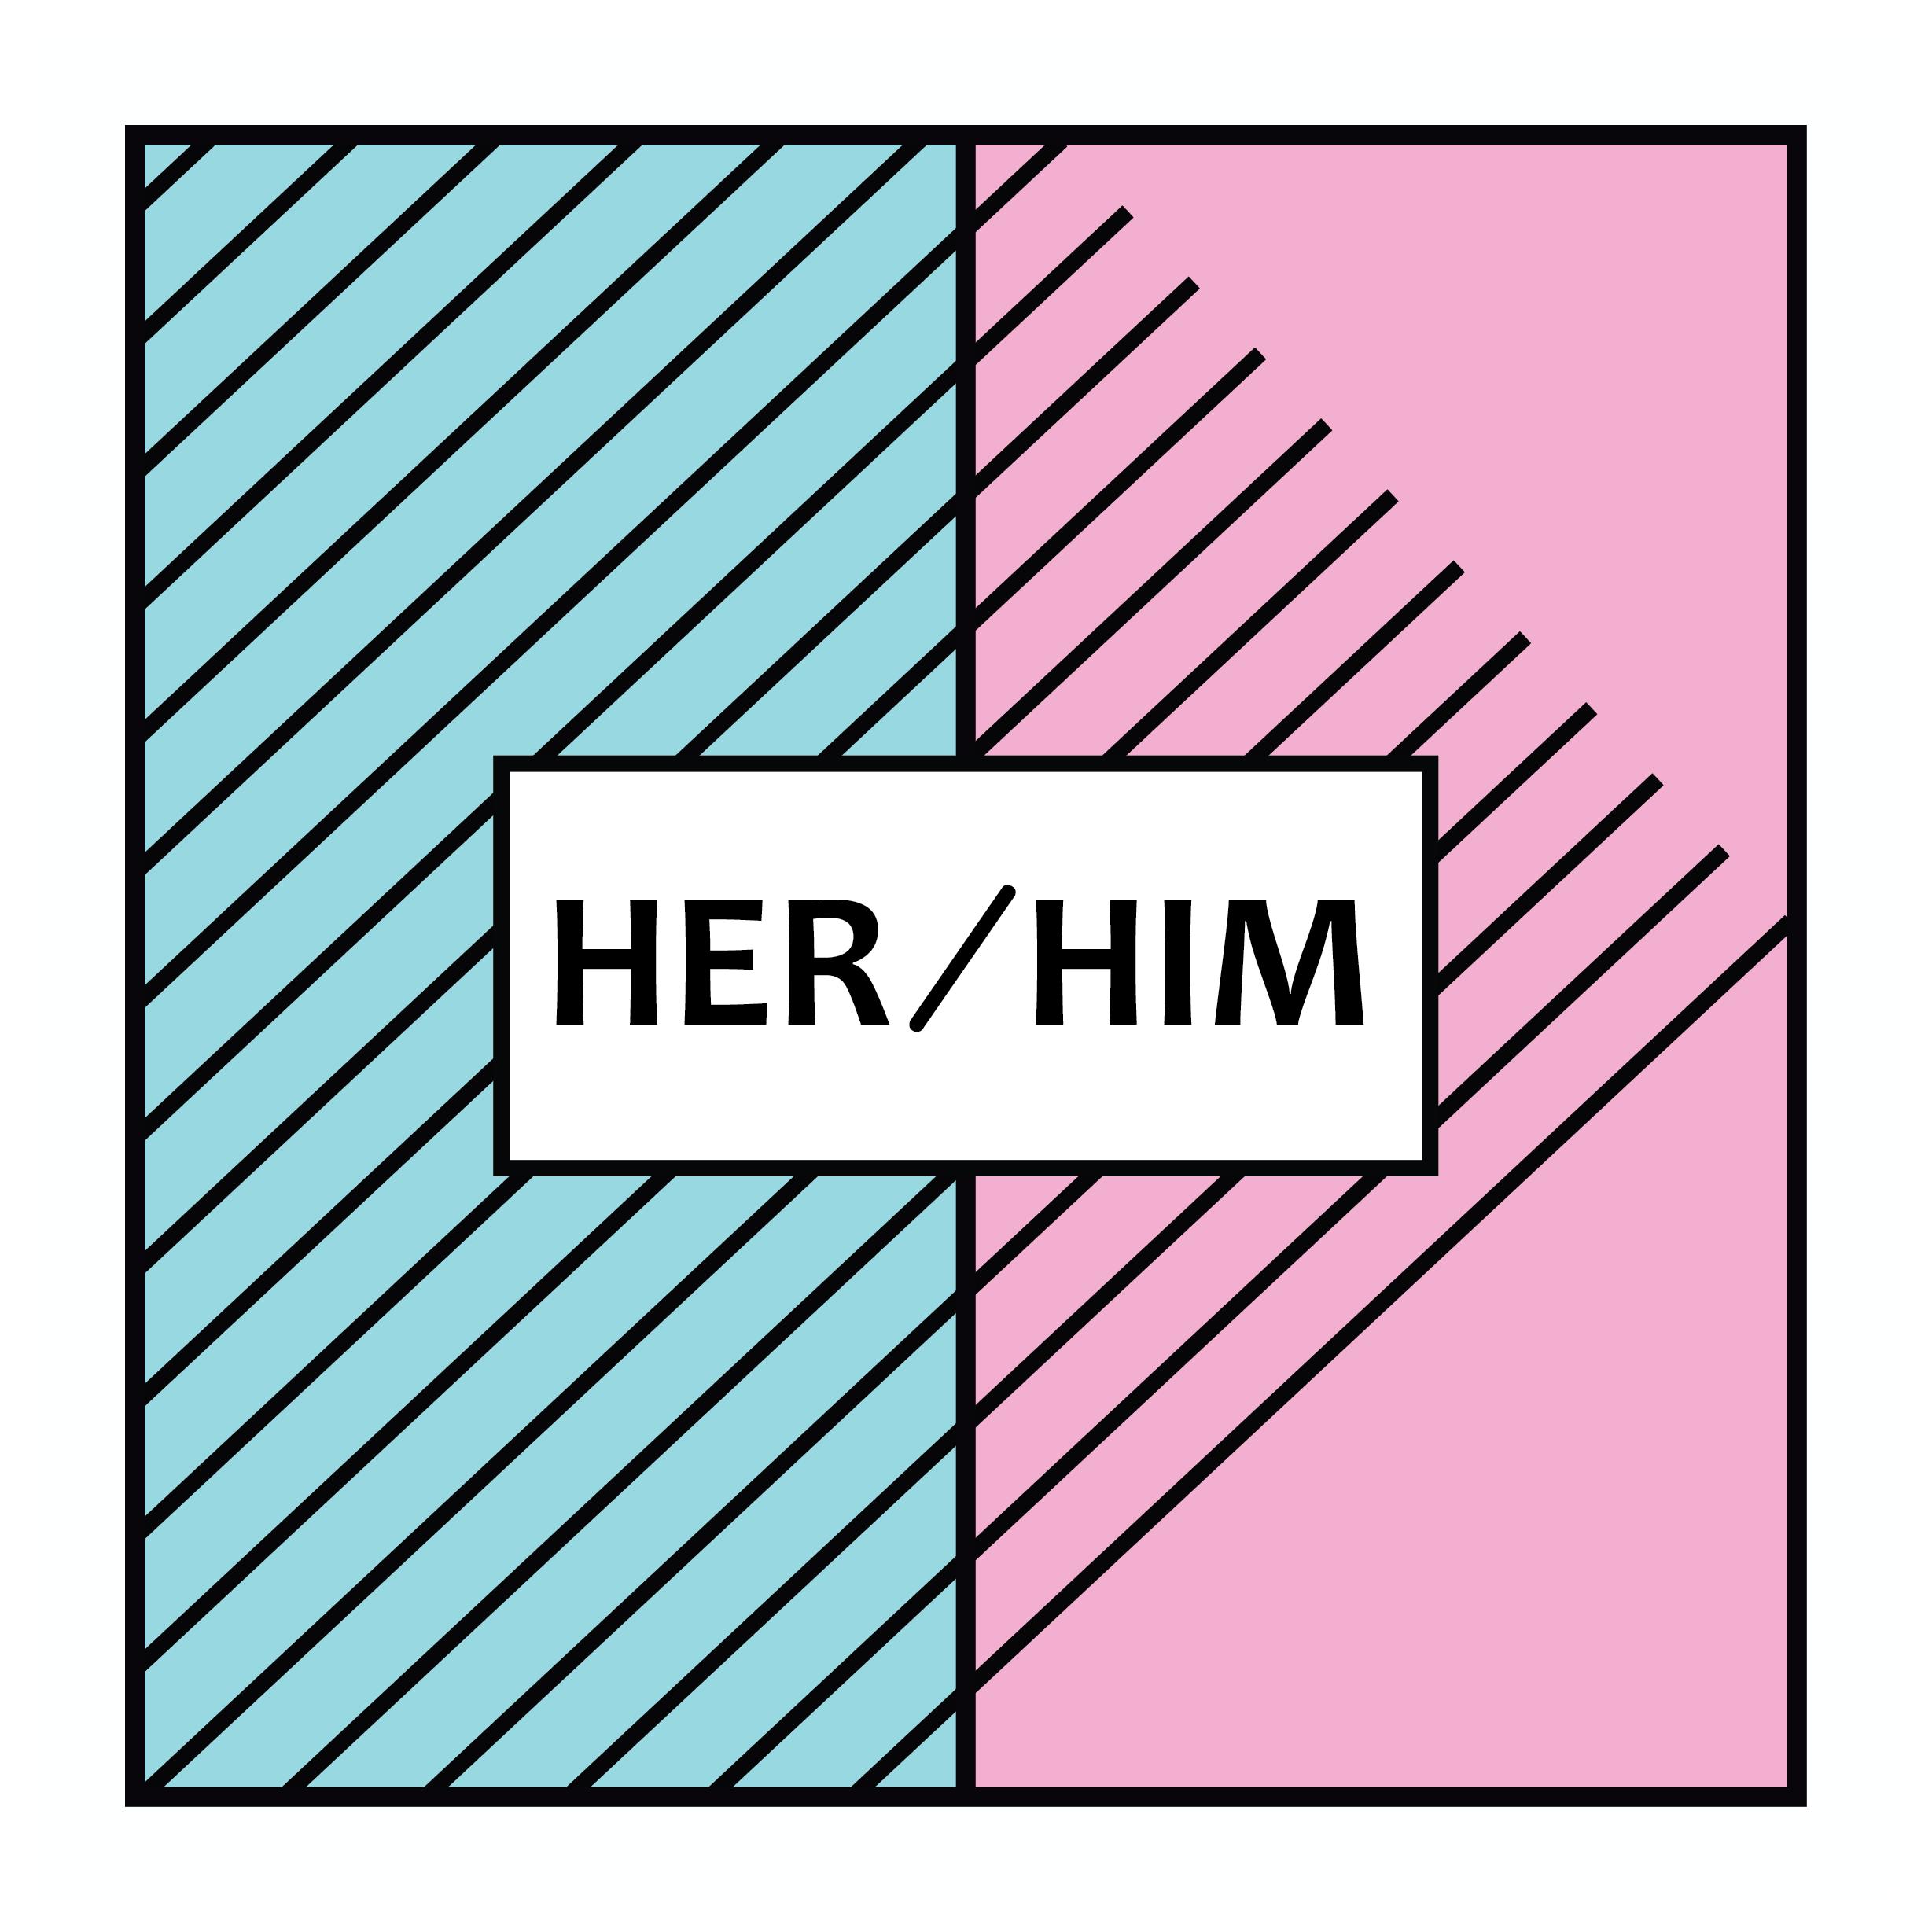 Her/Him logo